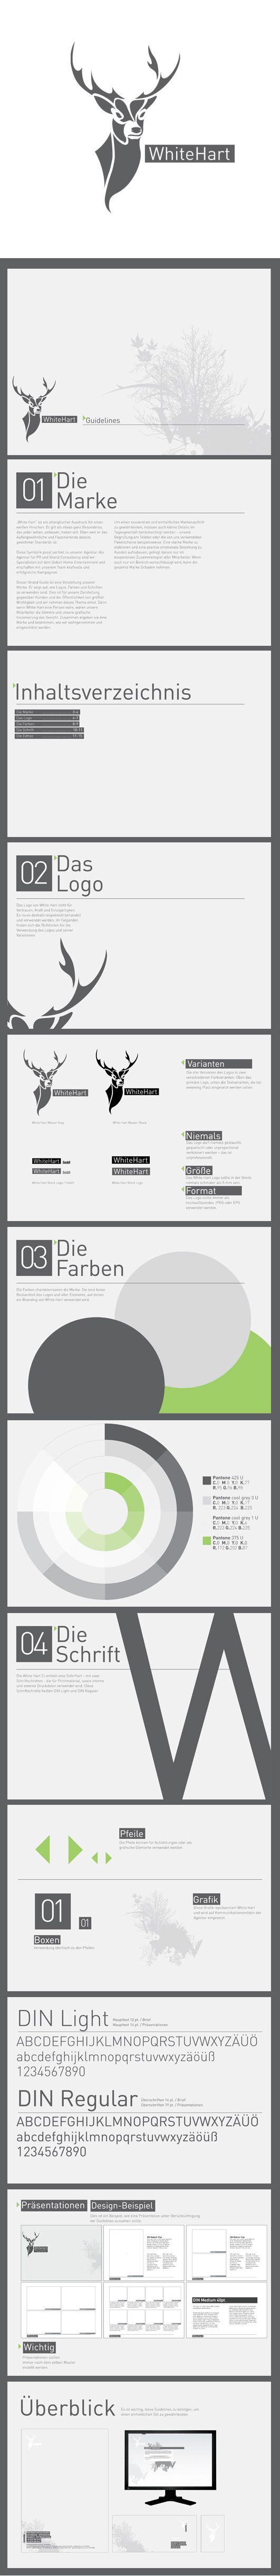 Cassandra cappello graphic design toronto - Branding And Guidelines On Branding Served Brand Identity Designcorporate Designgraphic